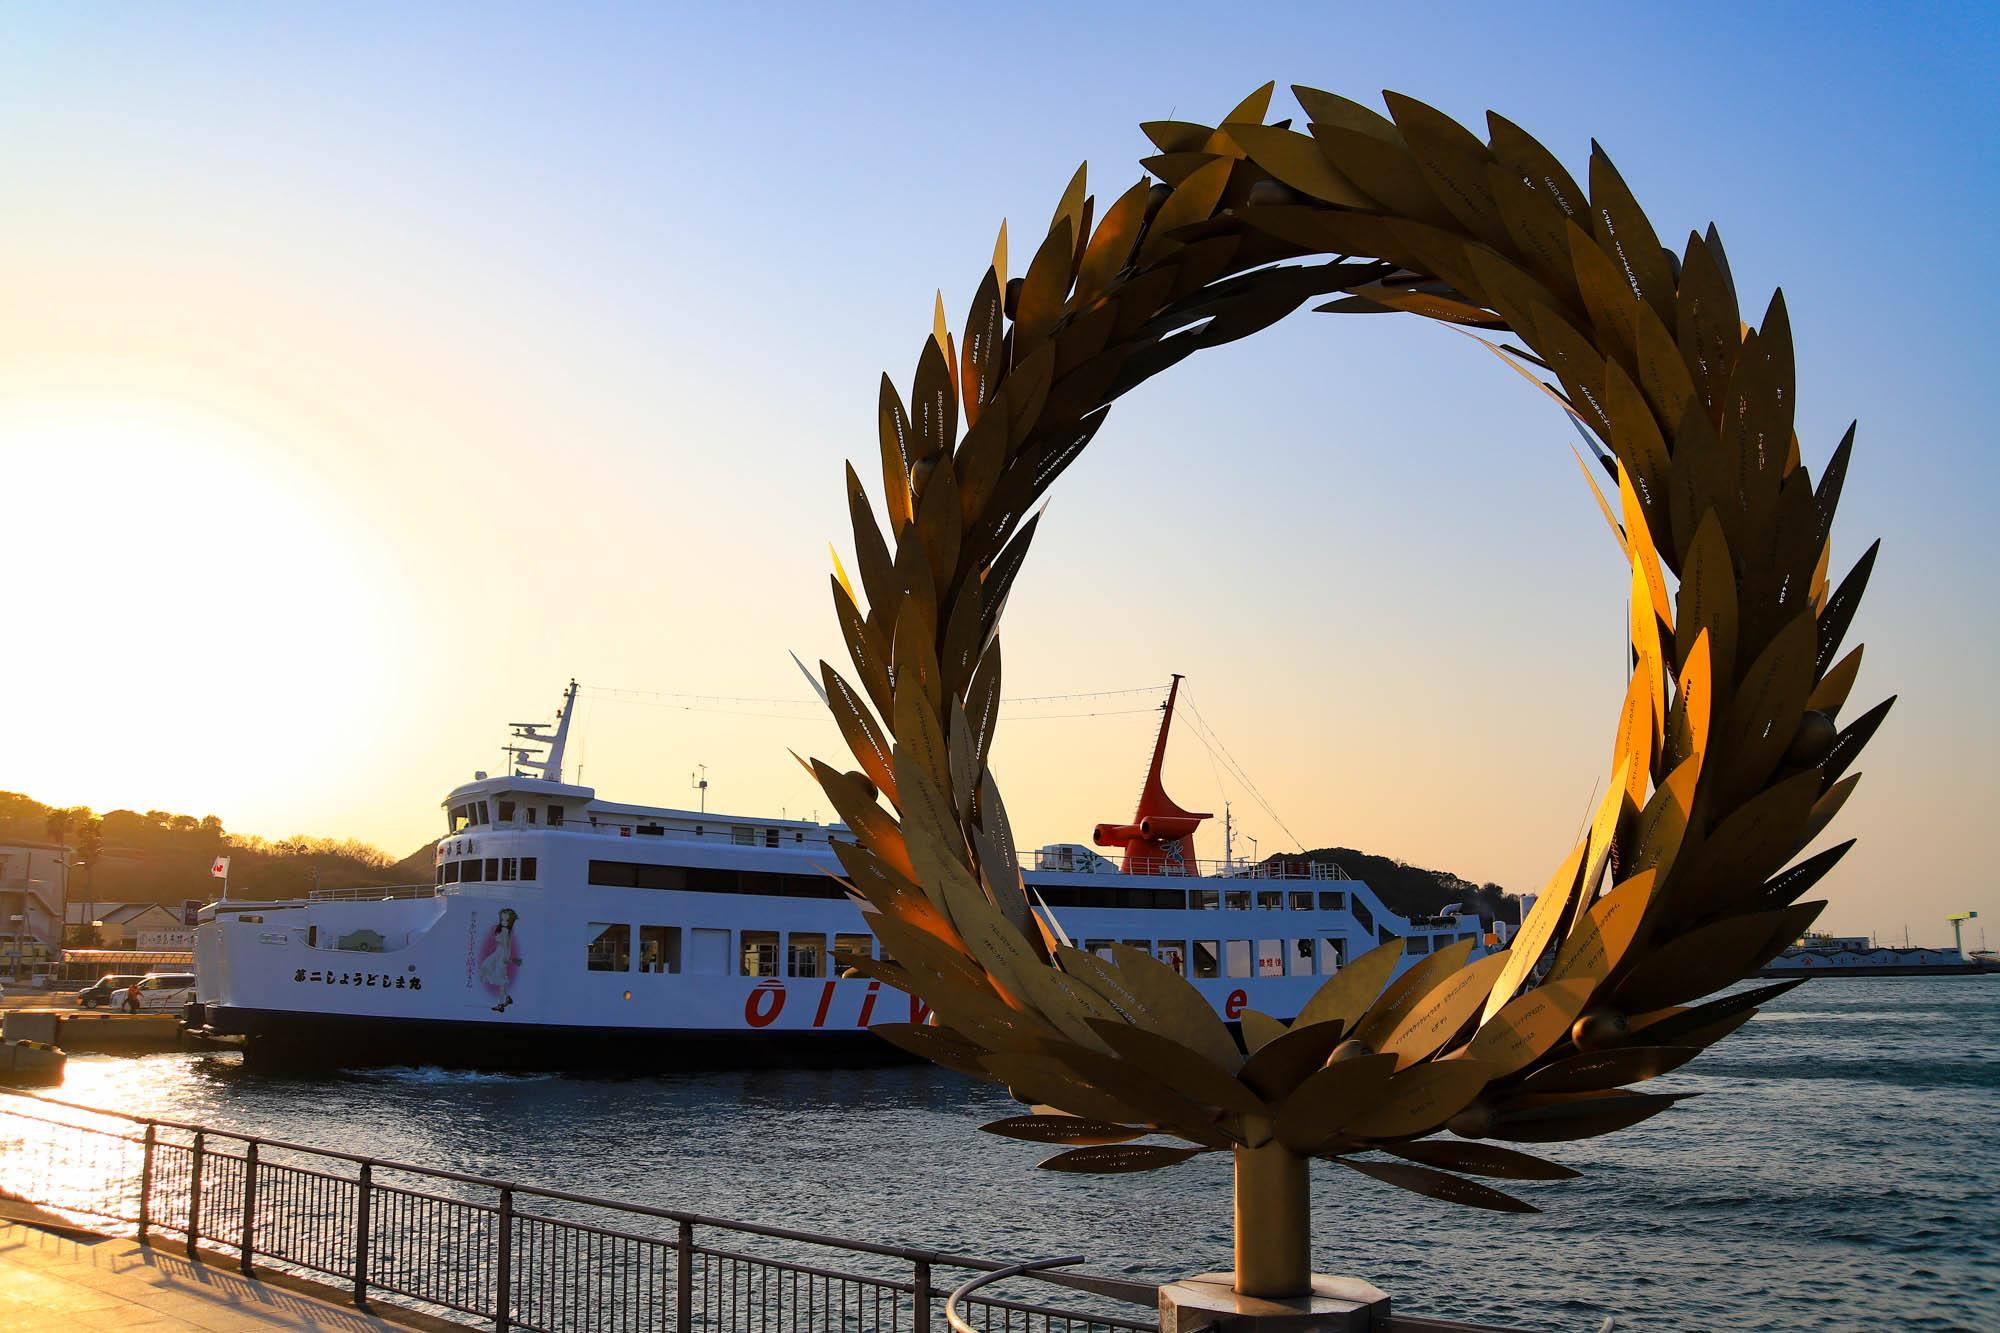 takagisan_ferry-7.jpg